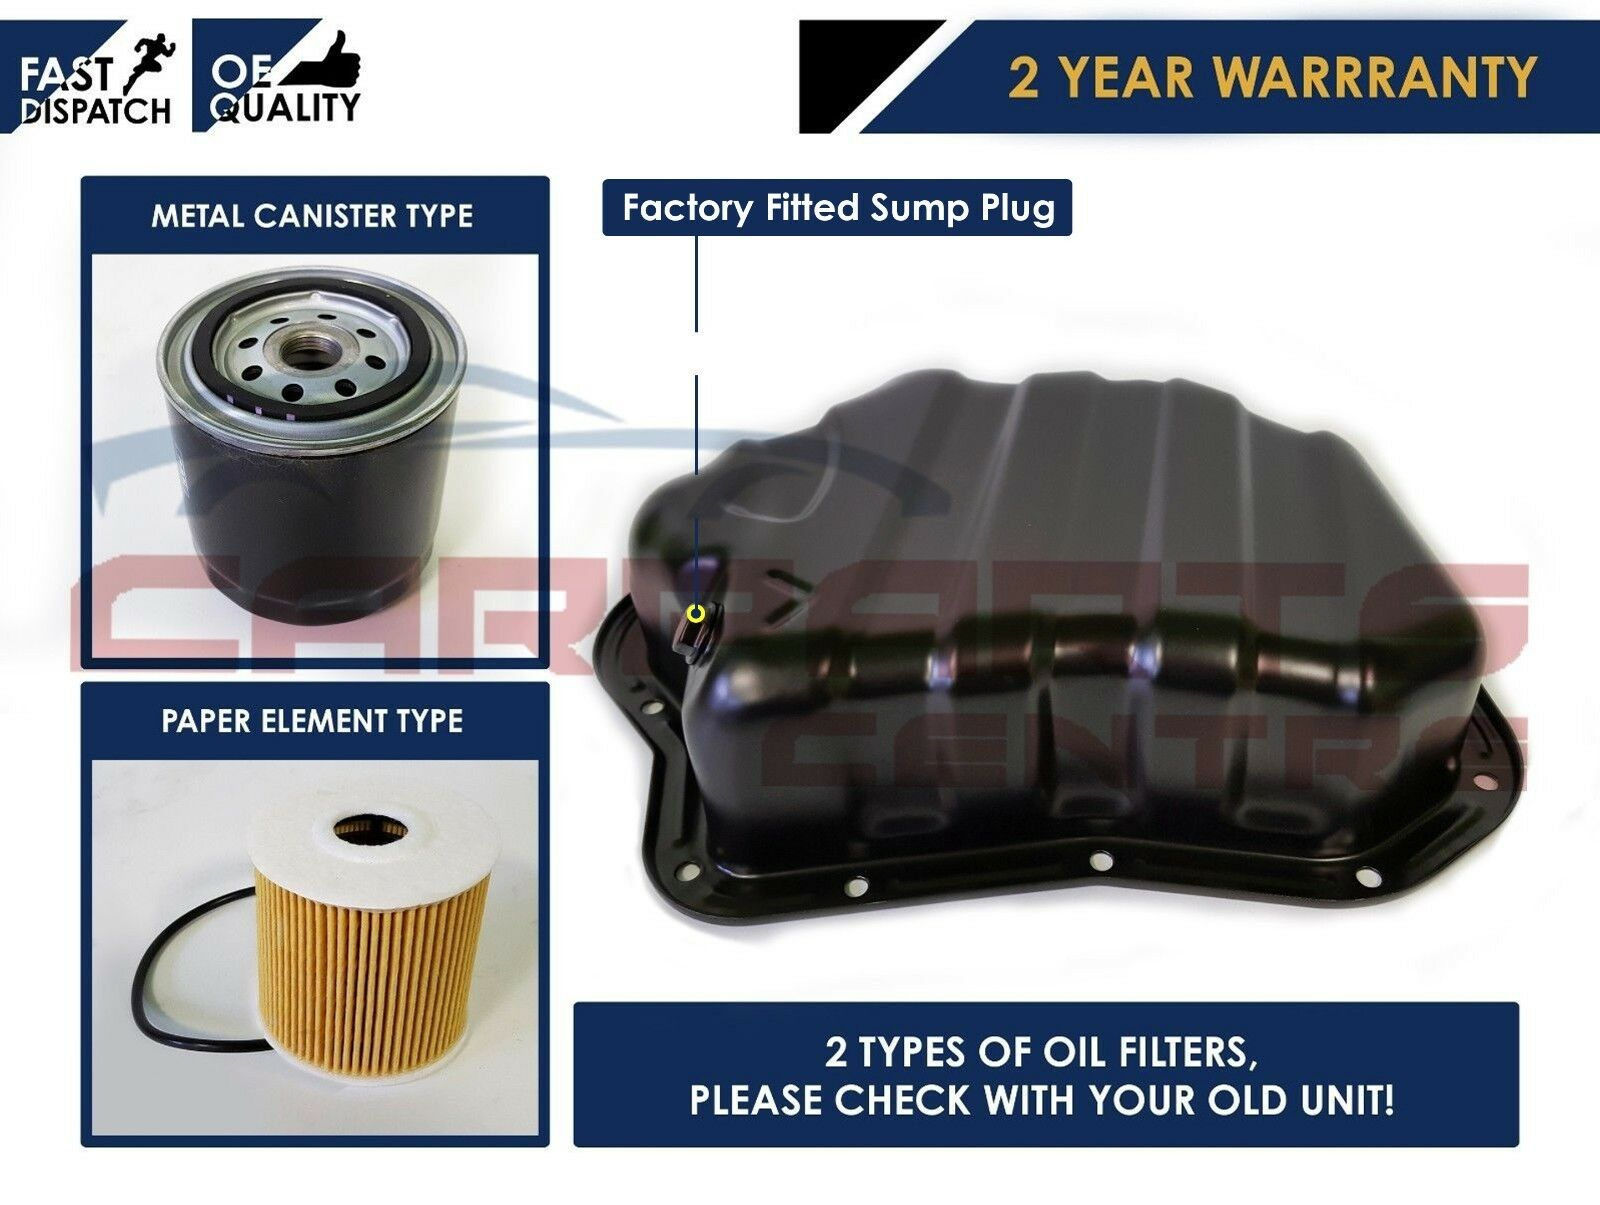 1x Cv Joint Kit Nissan X-TRAIL 2.0 T30 01-07 ABS